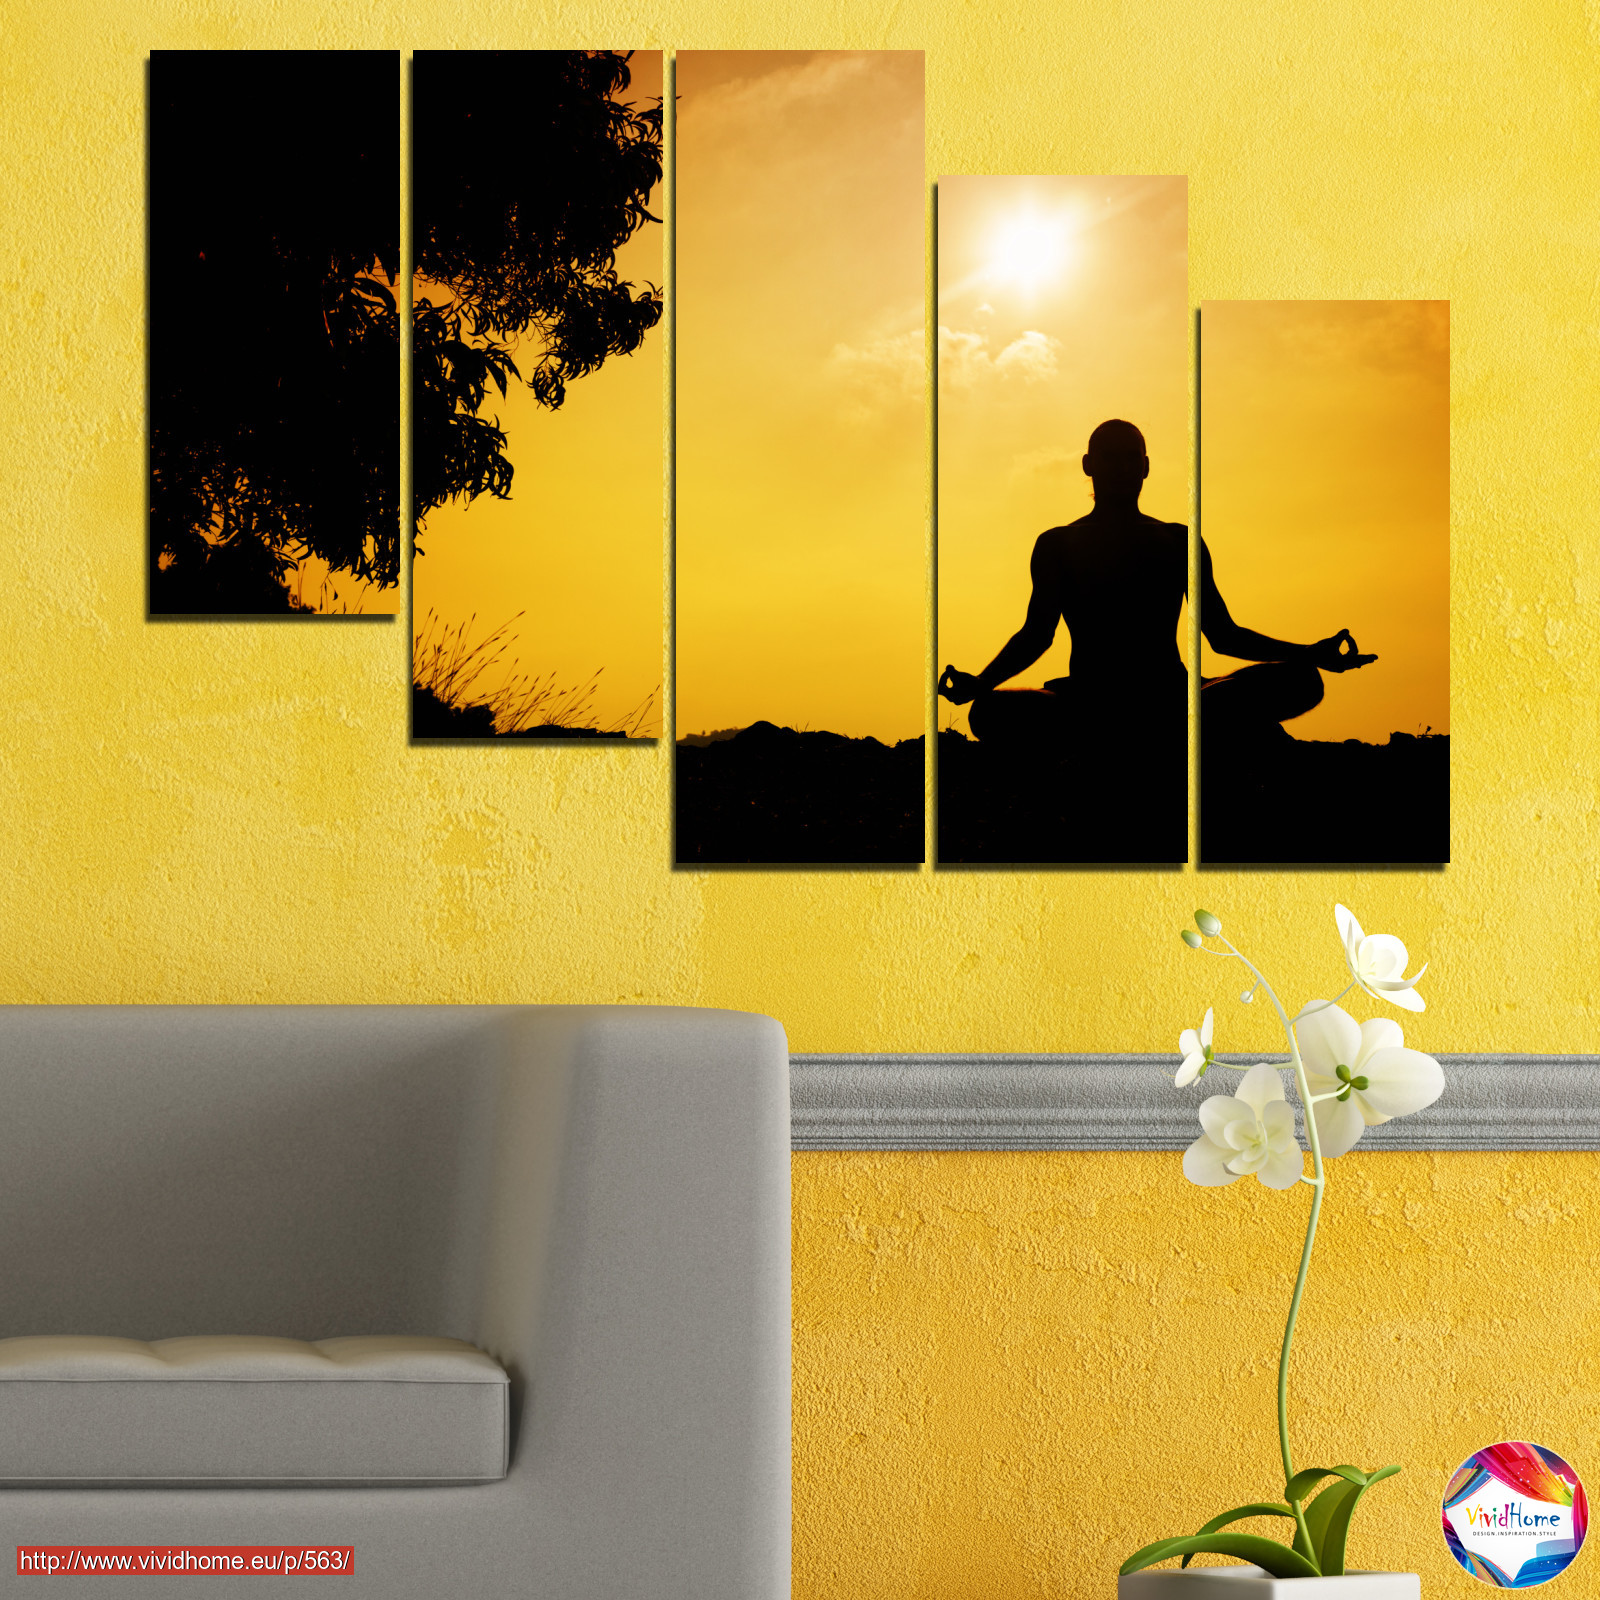 Sun, Spa, Shadow, Yoga №0563